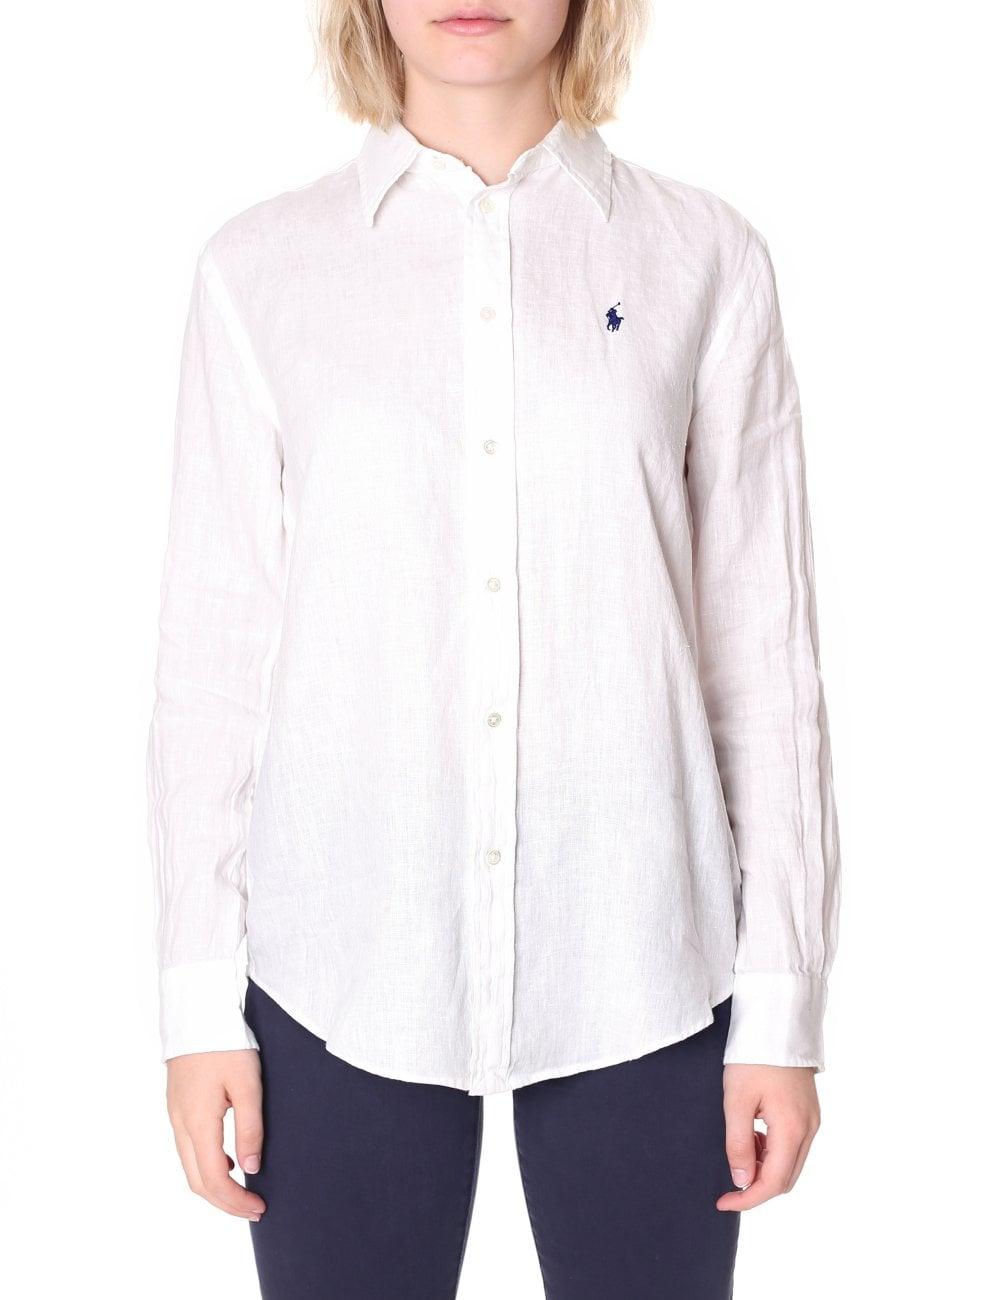 e654b5a6da ... Polo Ralph Lauren Women s Relaxed Long Sleeve Shirt. Tap image to zoom.  Women  039 s Relaxed Long Sleeve Shirt. Women  039 s Relaxed Long Sleeve  Shirt